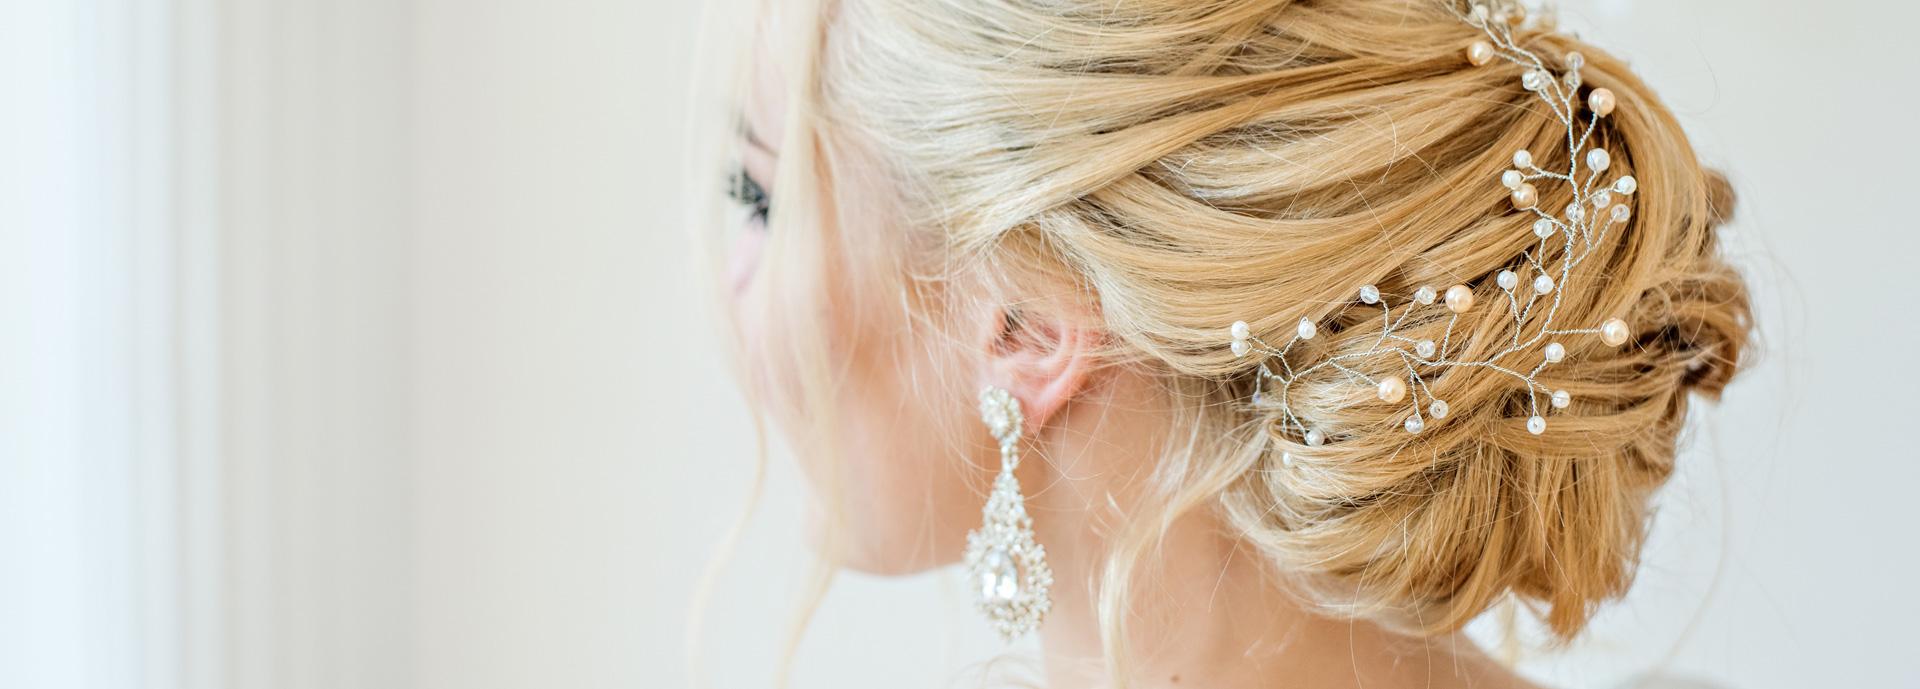 Wedding Hair And Makeup Surrey Bridal Hair Surrey Nw Makeup